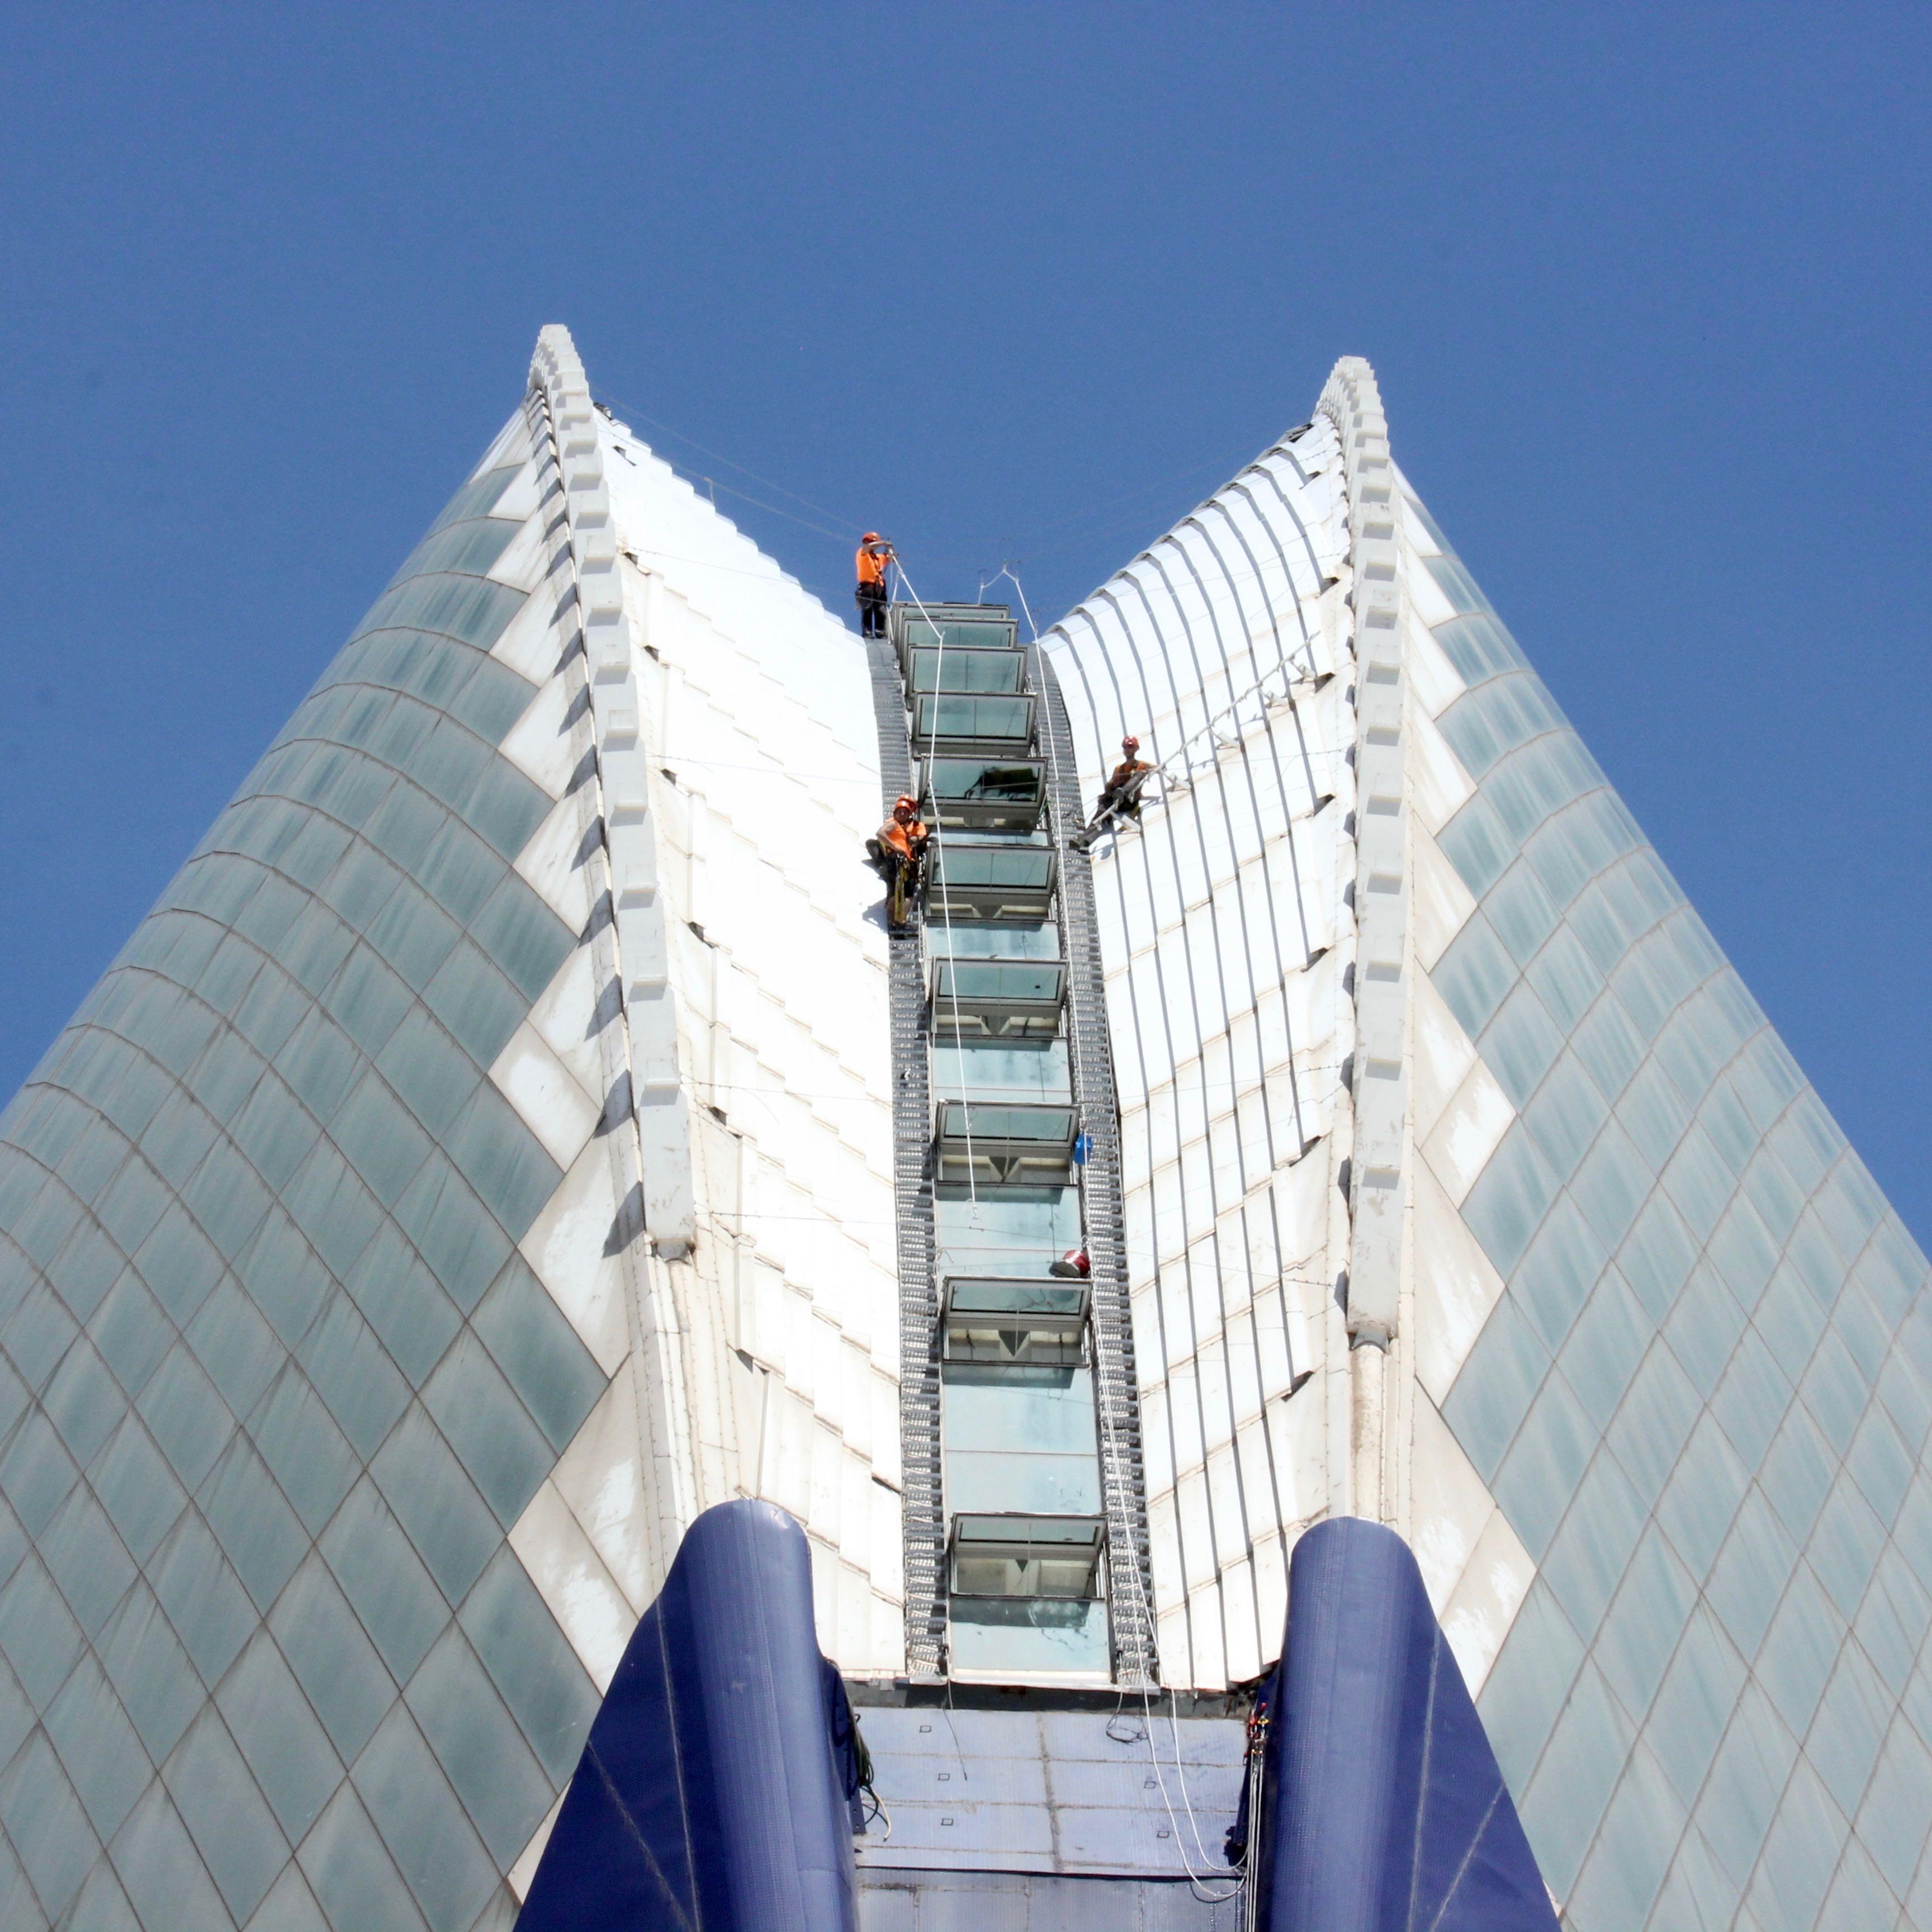 Valencia, Spain Calatrava 4